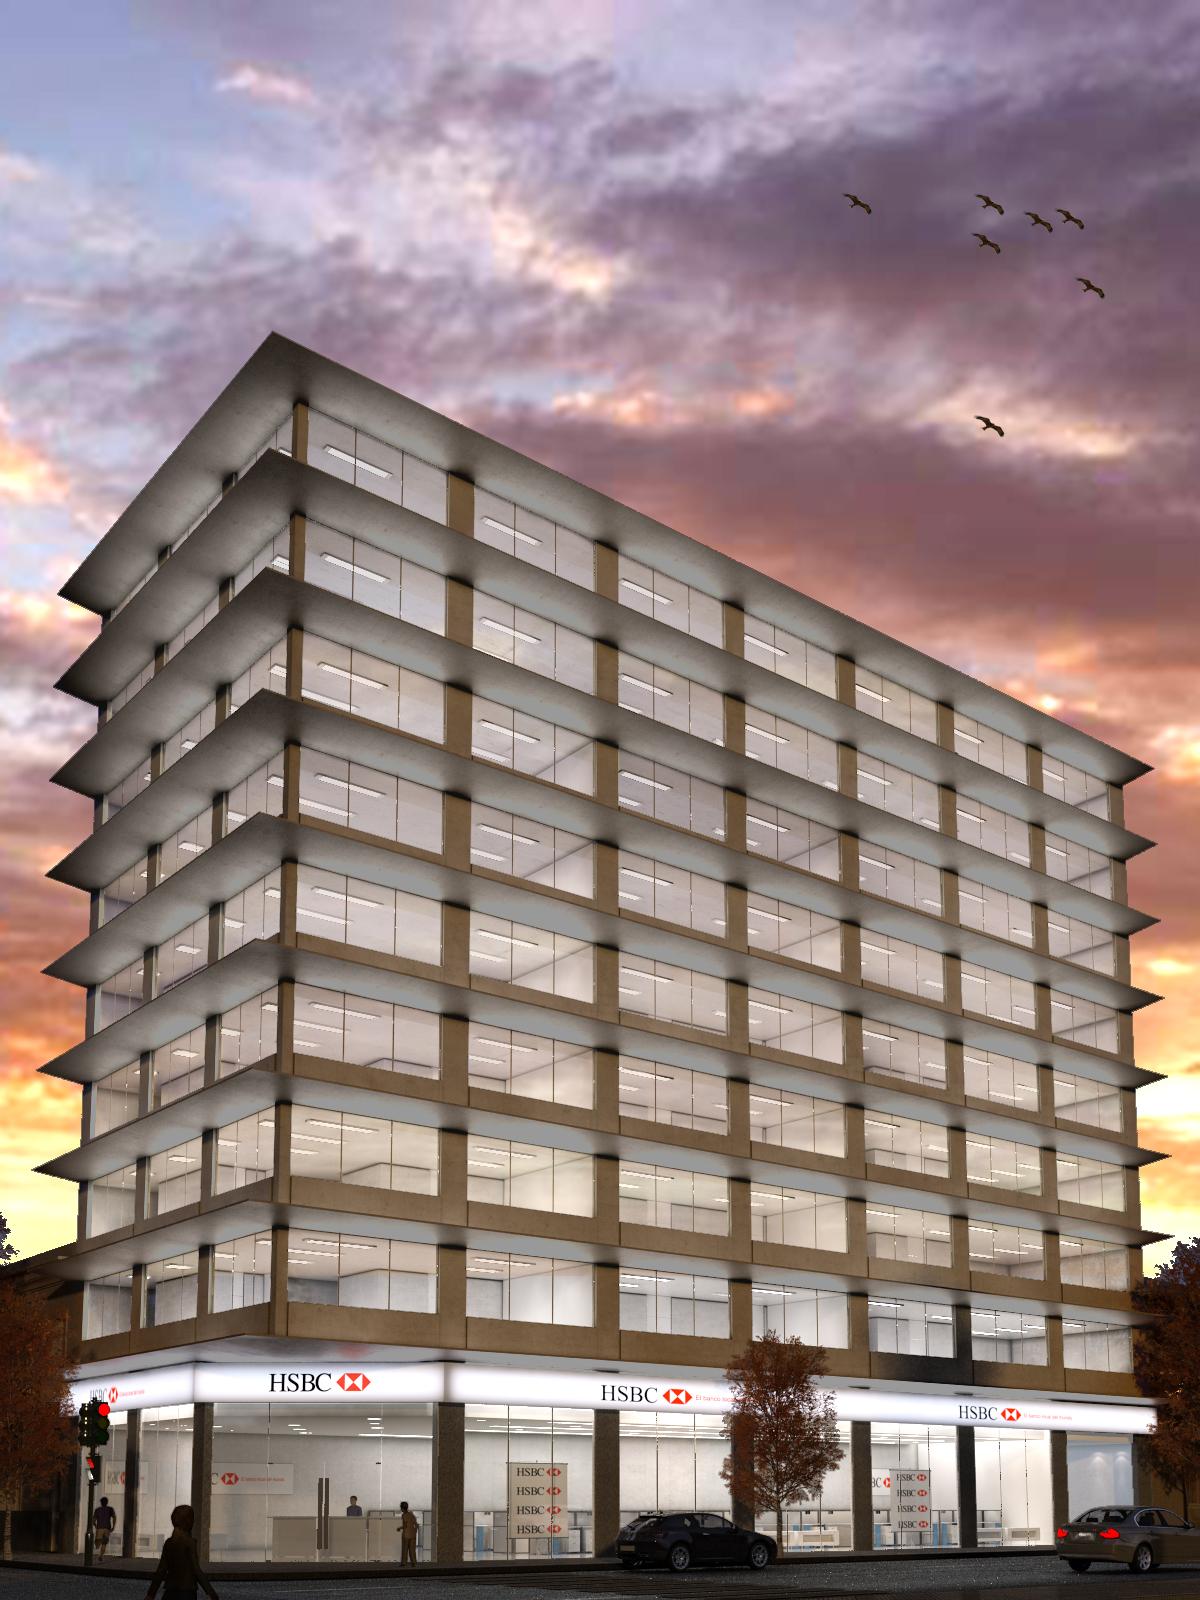 Voxel cg edificio oficinas prov san juan for Edificio oficinas